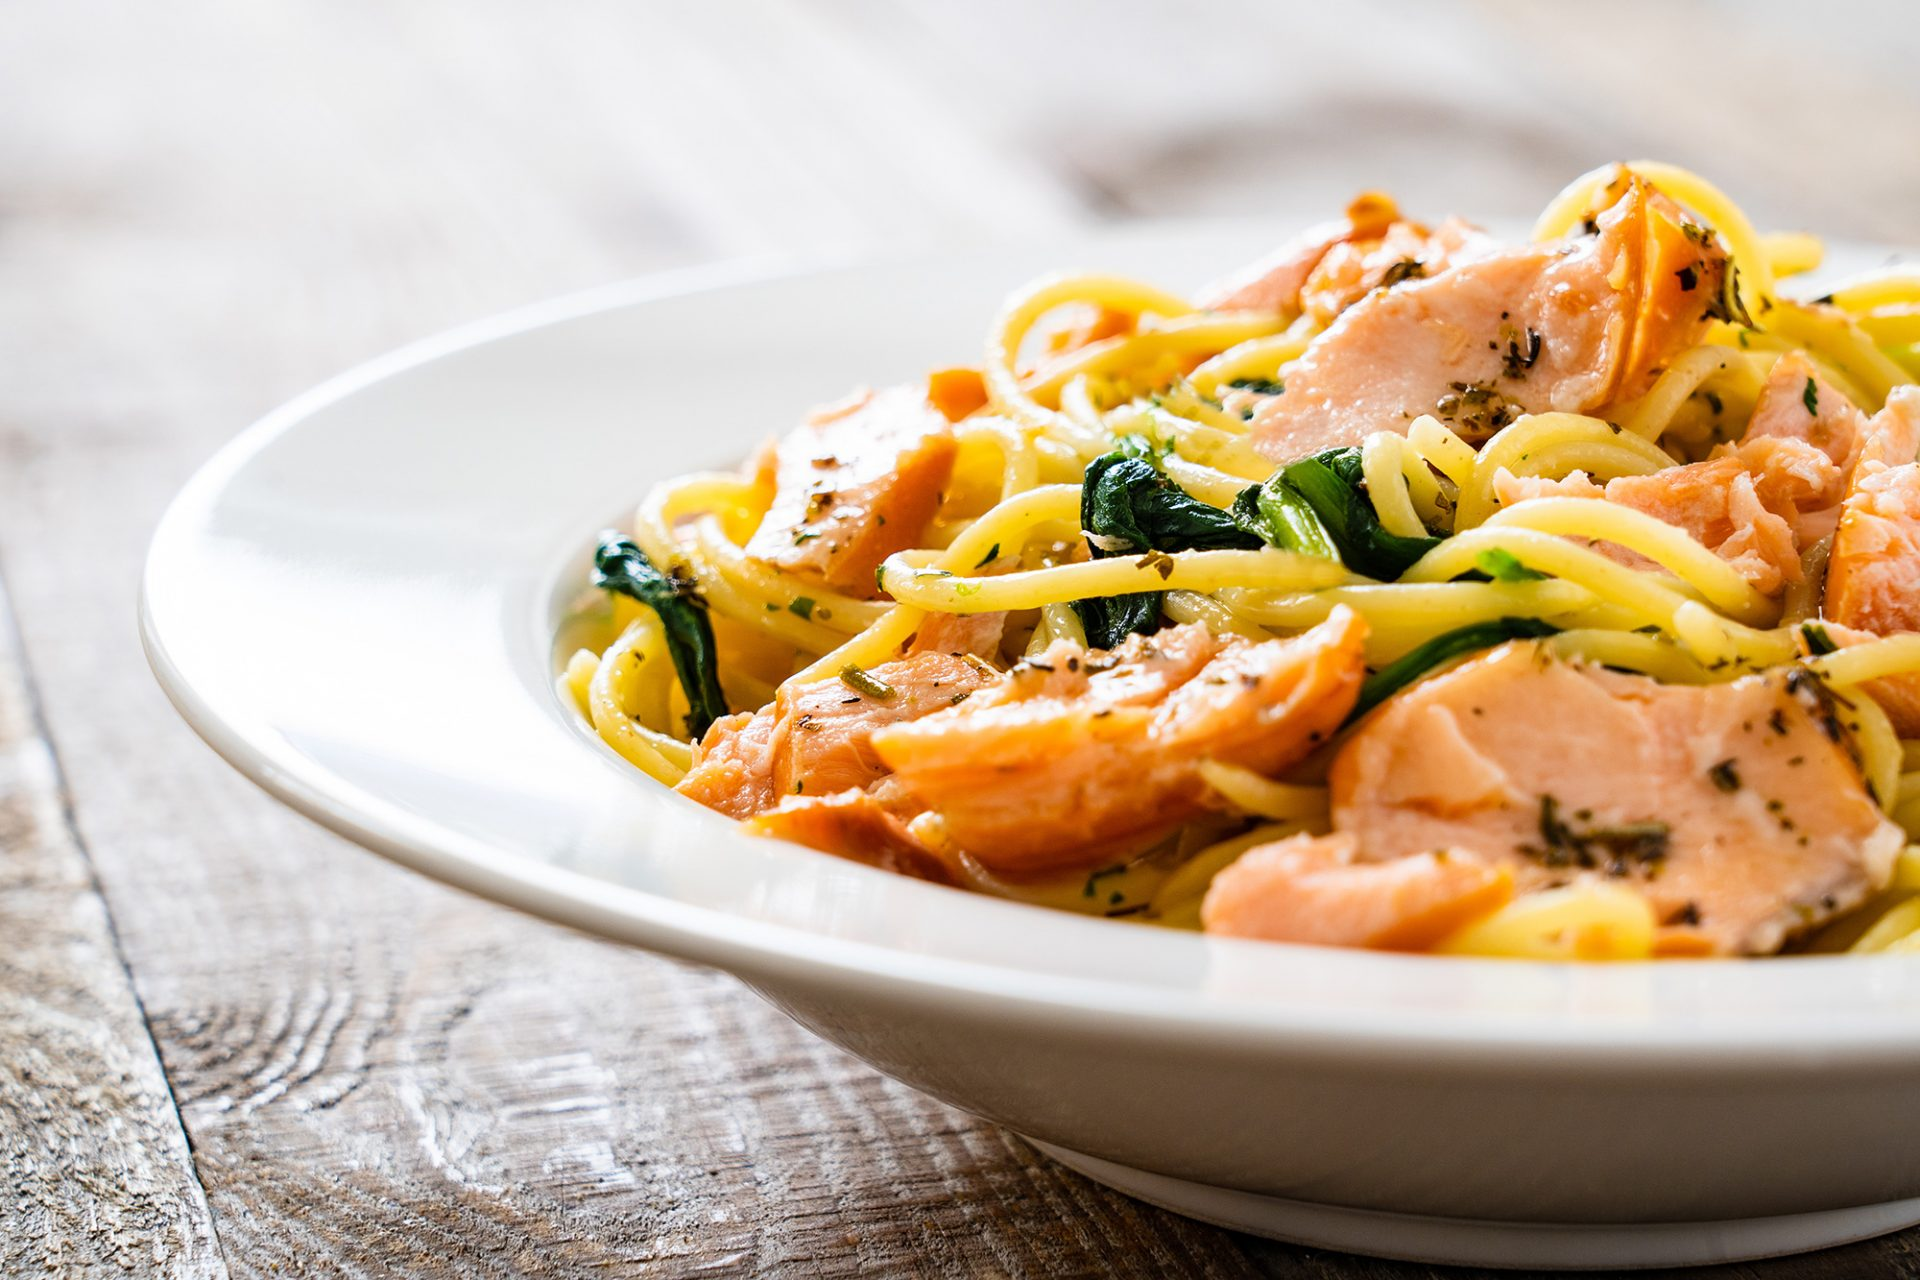 Spaghettini with Salmon, Lemon and Rainforest Season